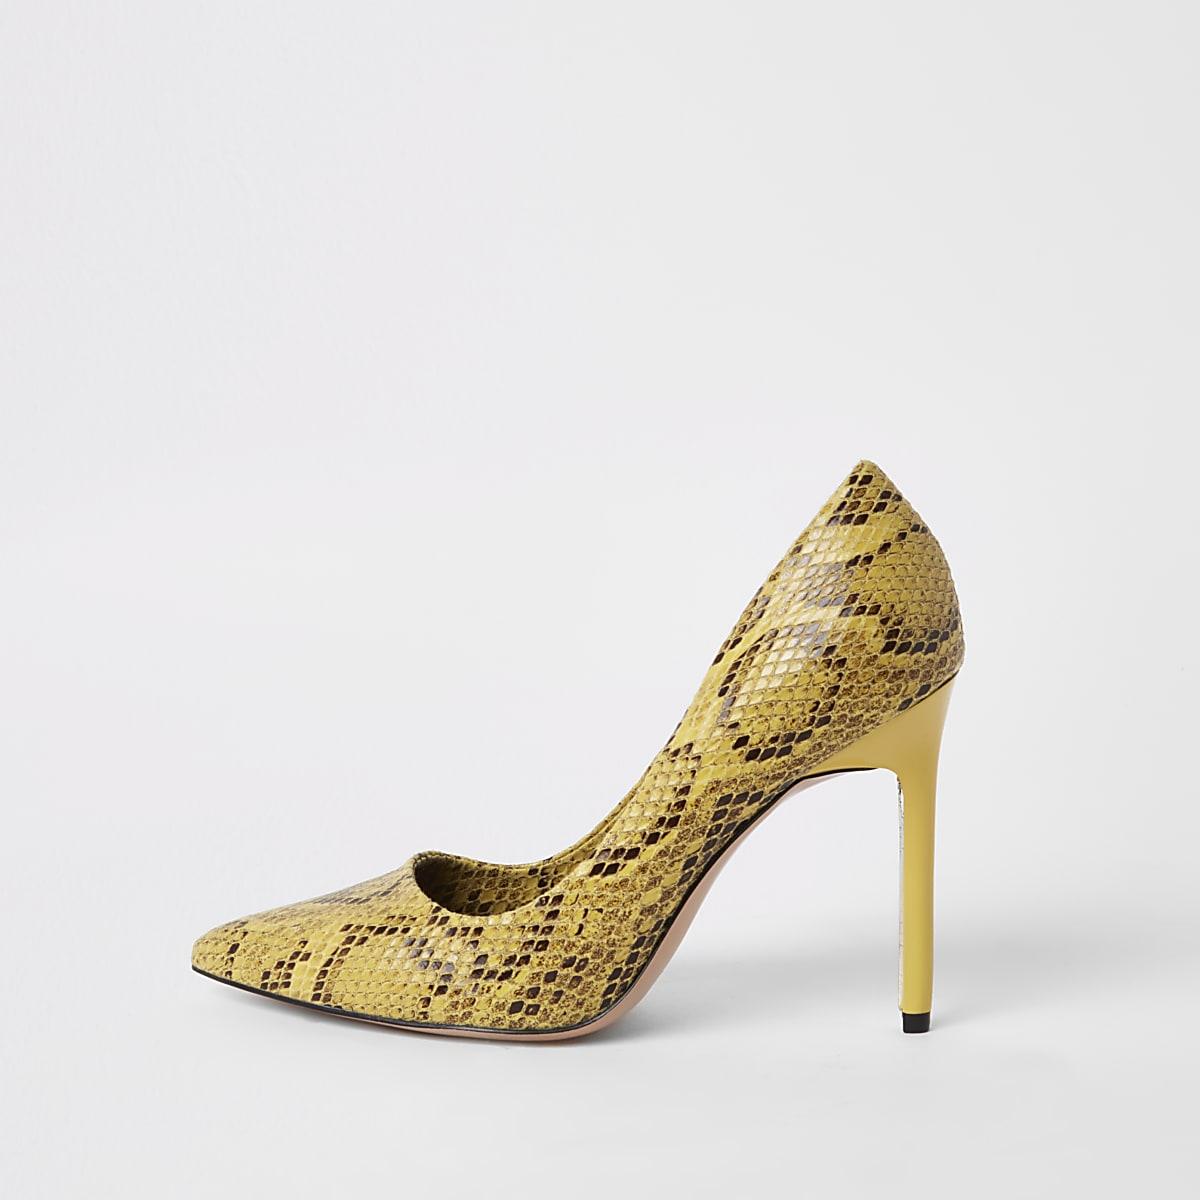 Escarpins imprimé serpent jaunes